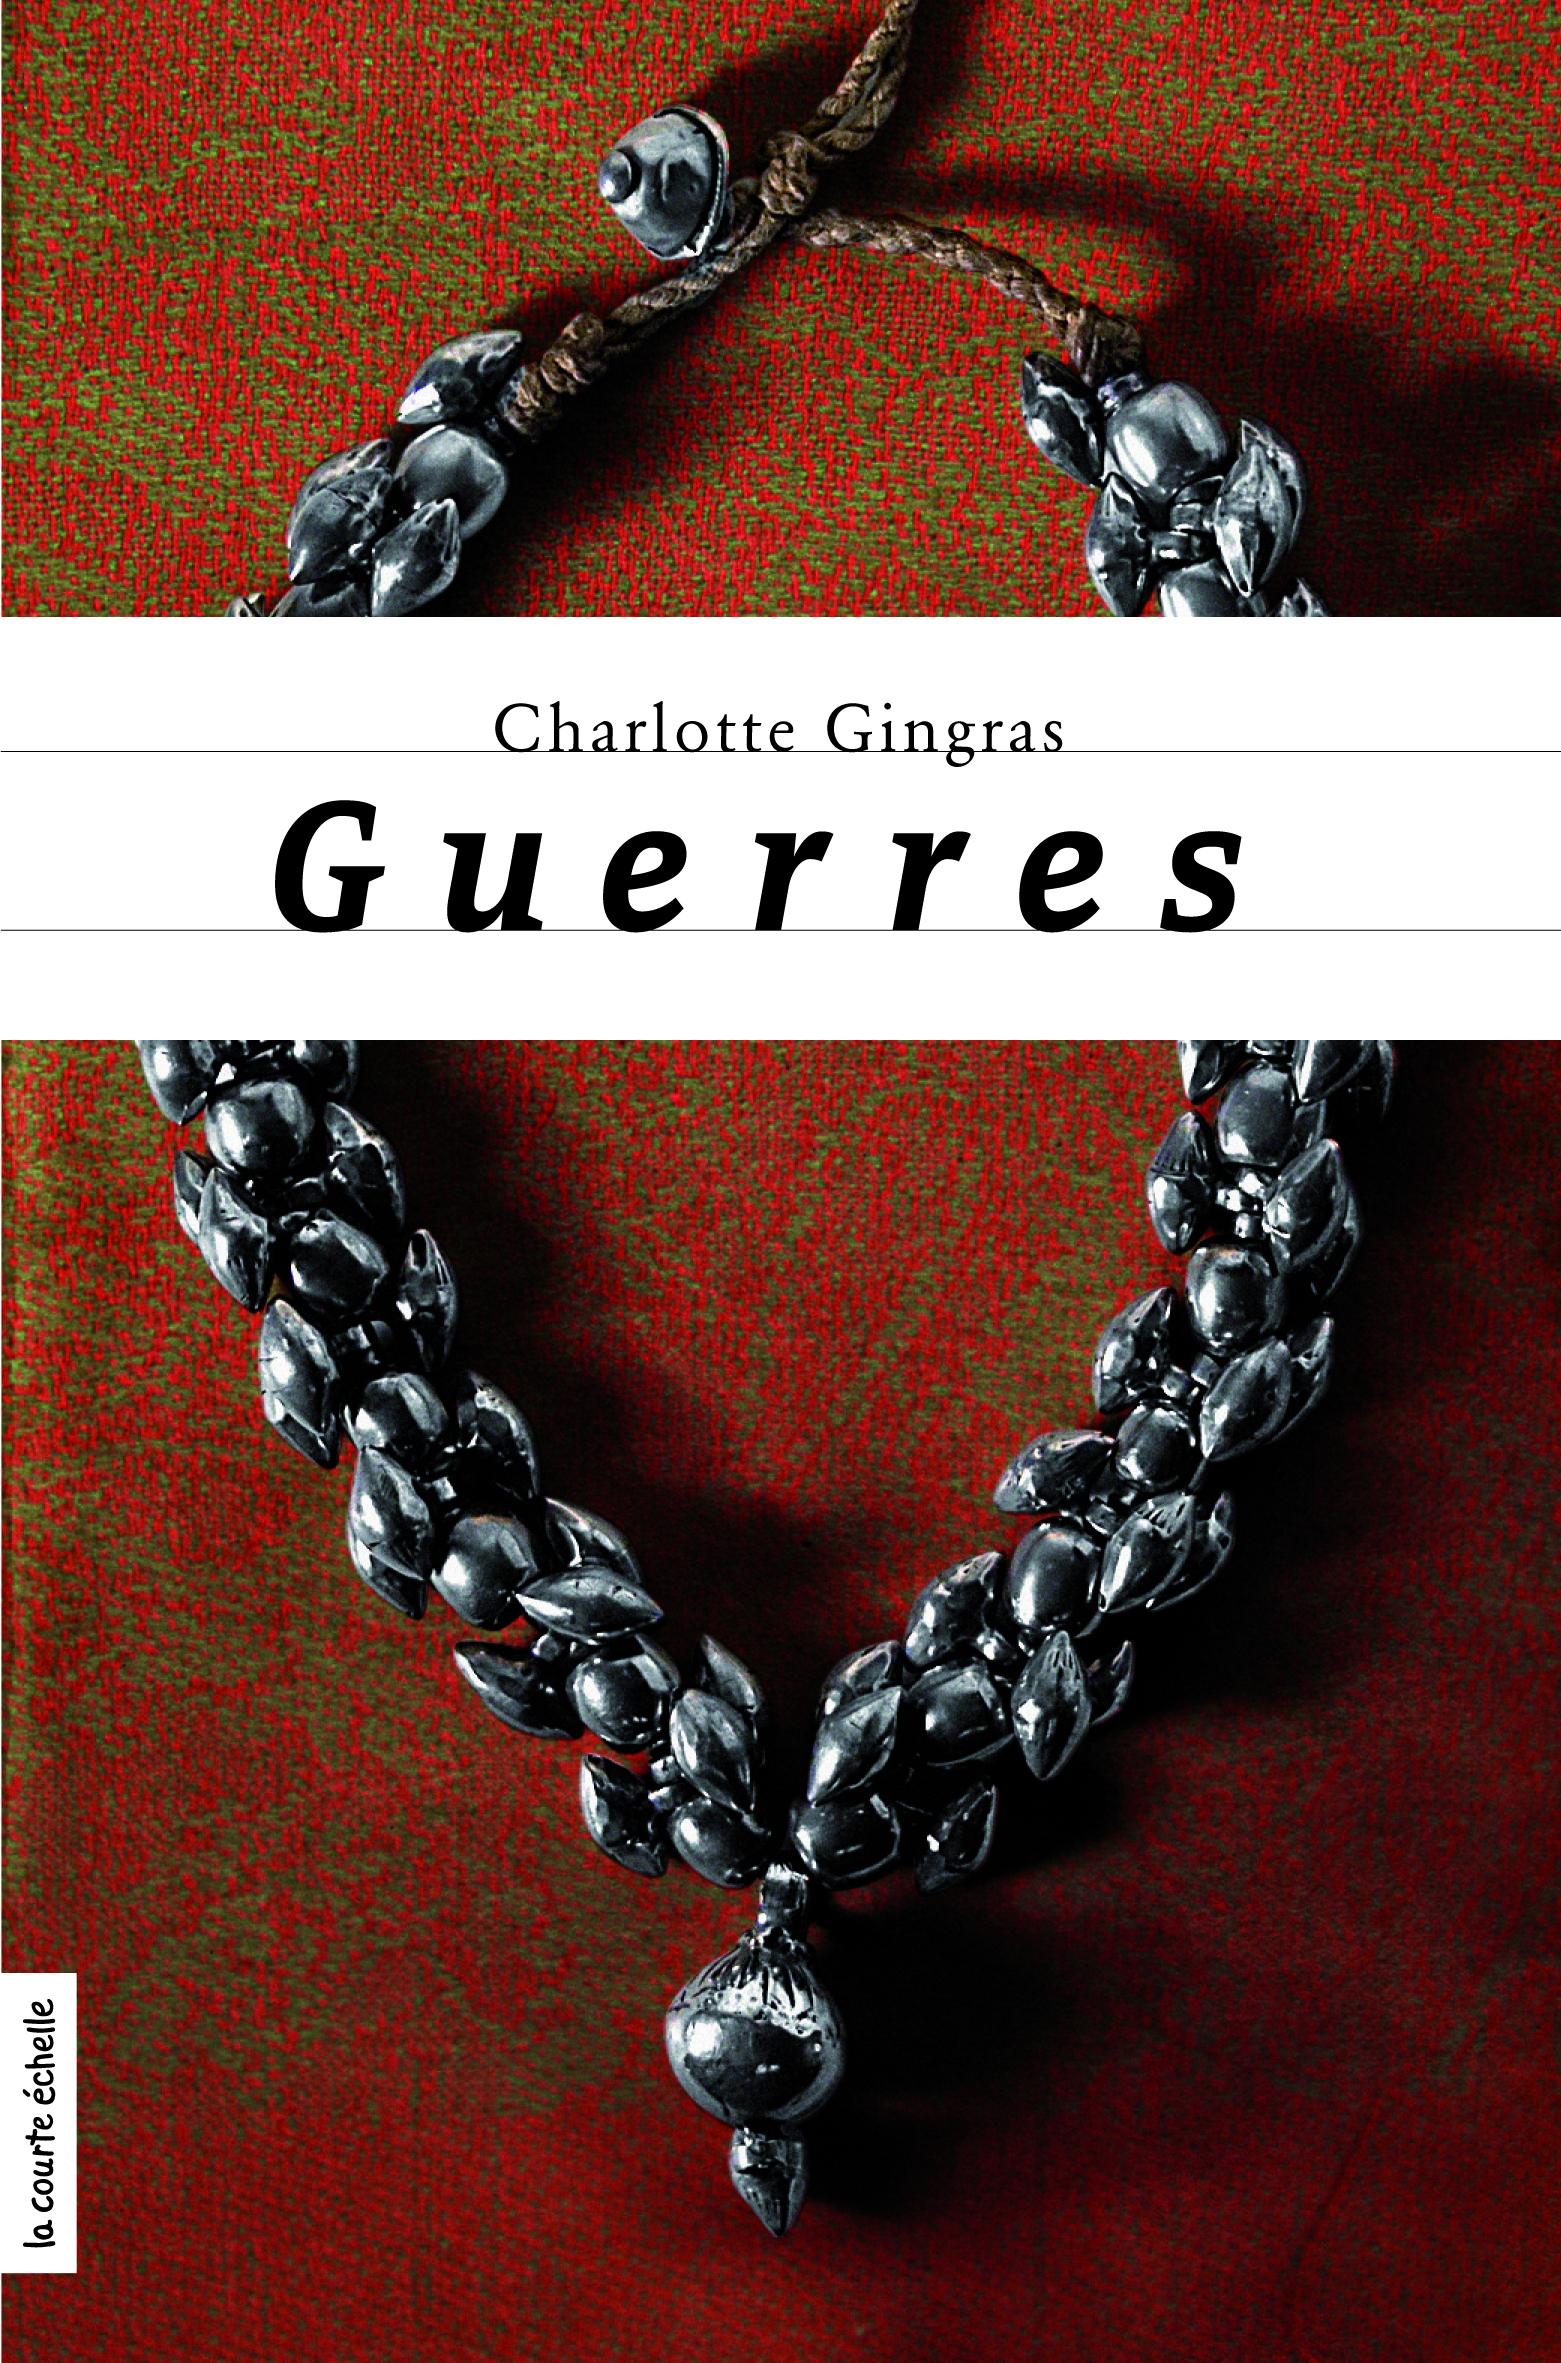 Couverture : Guerres Charlotte Gingras